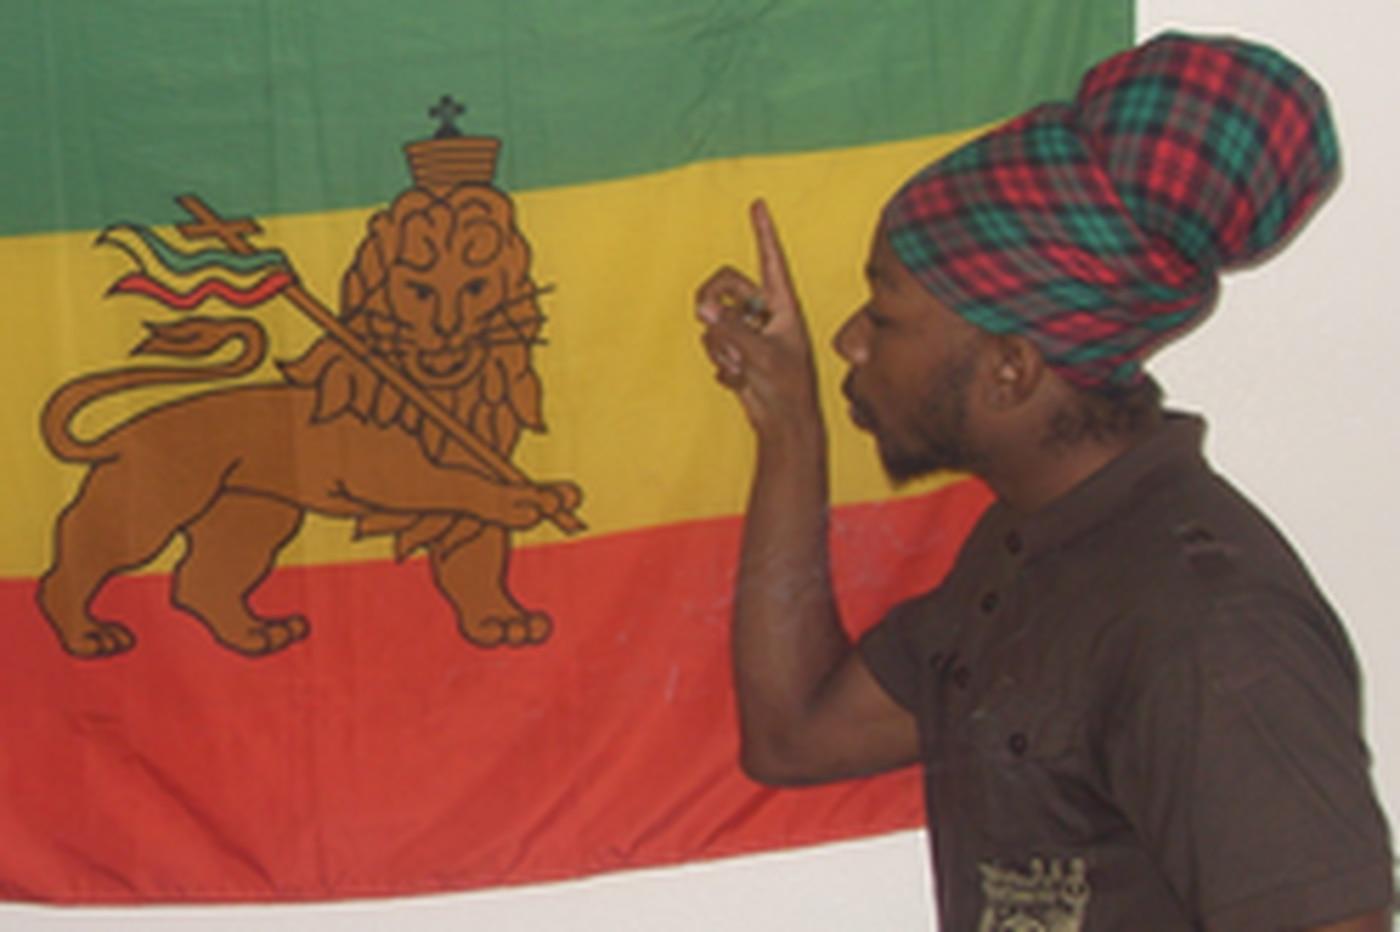 Reggae musician wanted in Calif. captured in Philadelphia